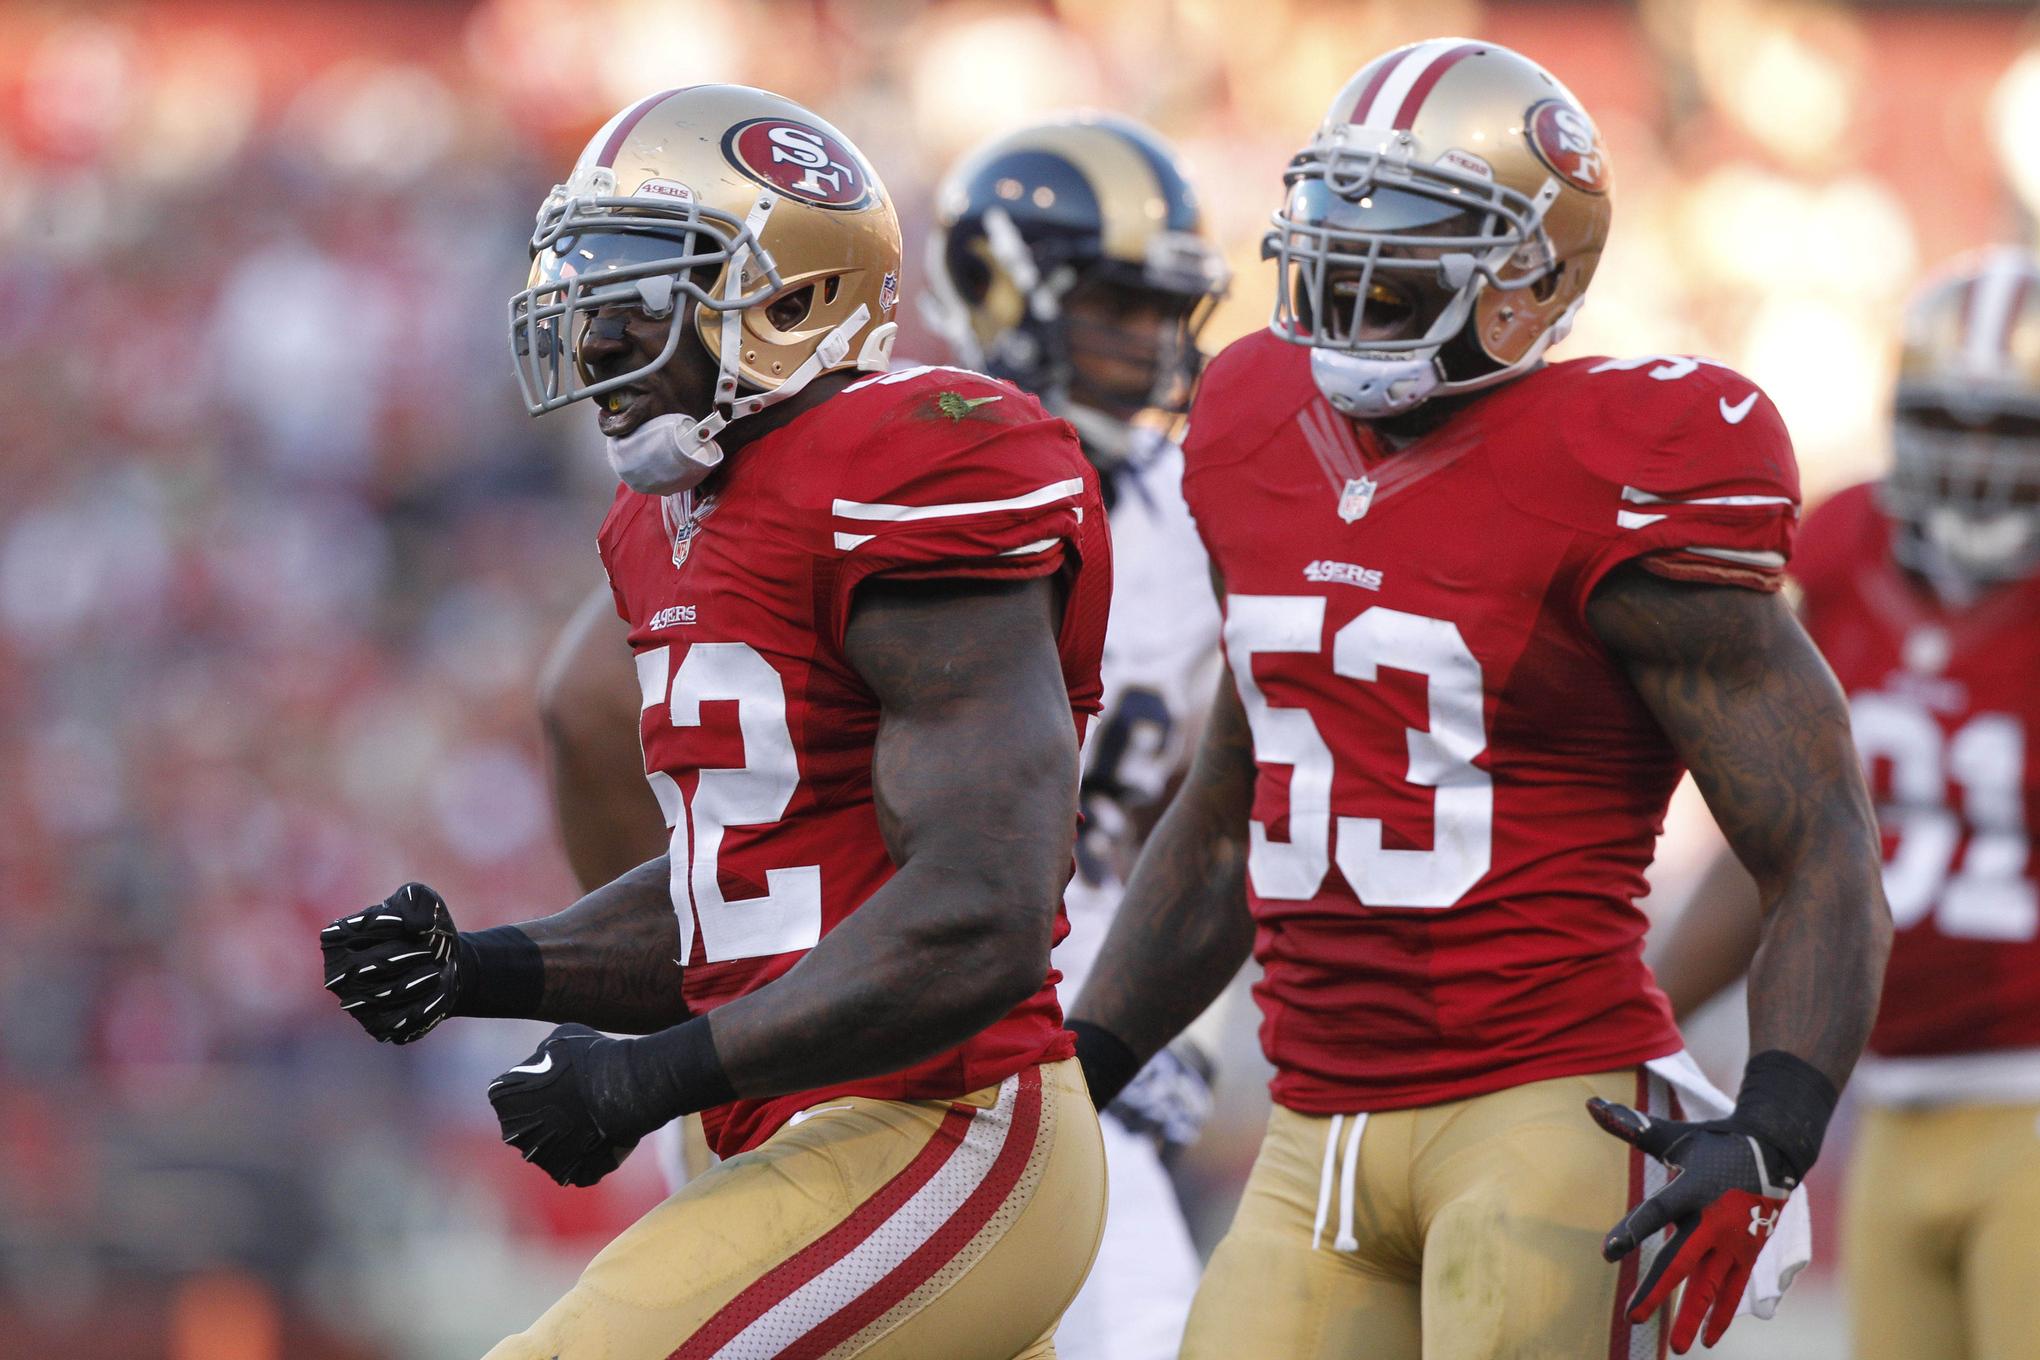 Jerseys NFL Wholesale - NFL's best linebacker corps: Bills, 49ers lead the way - SBNation.com